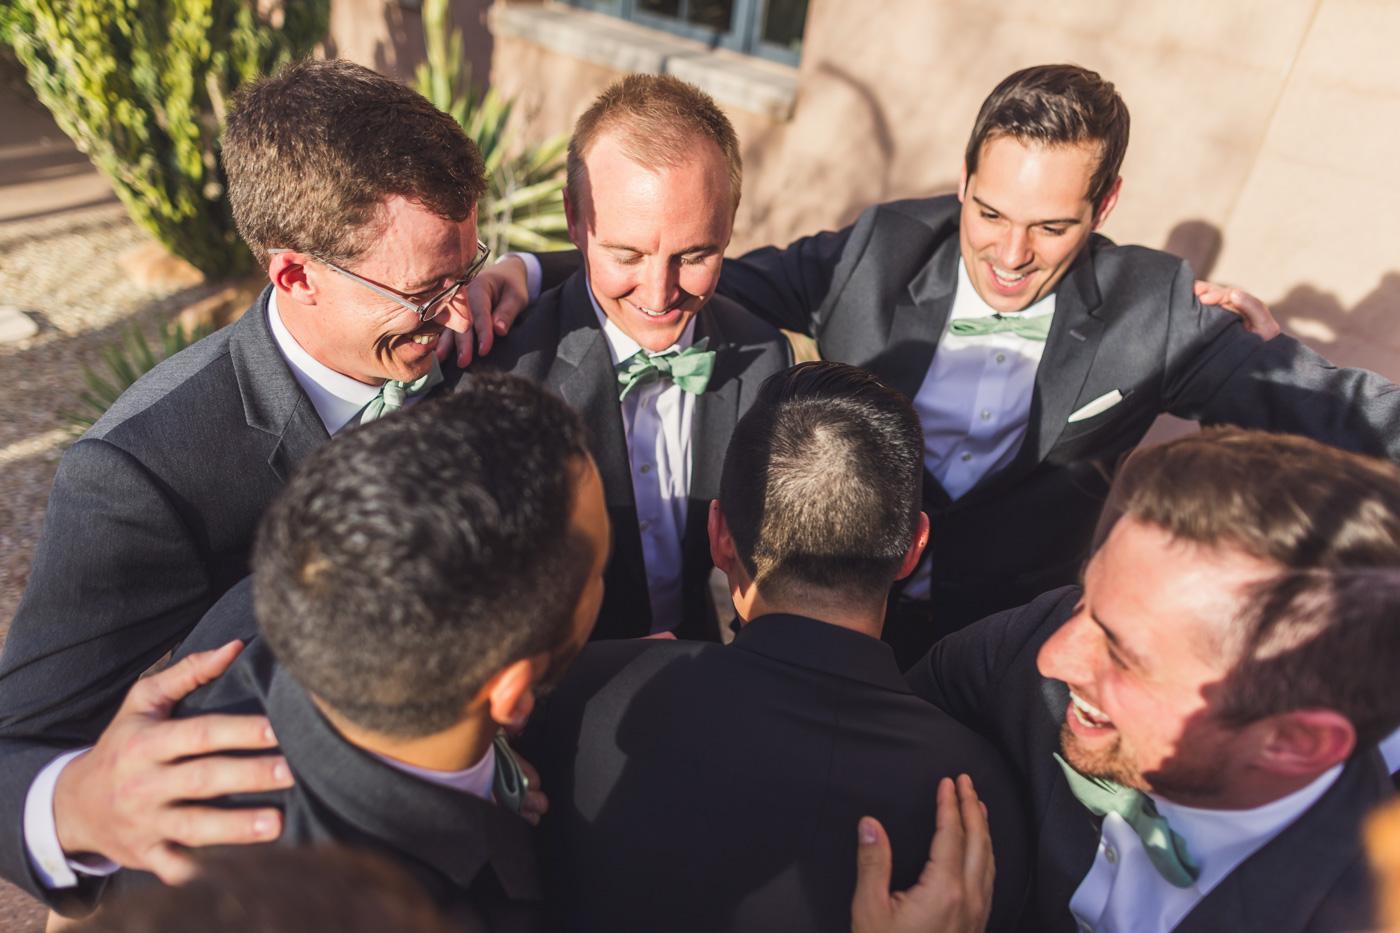 groomsmen-celebrate-with-groom